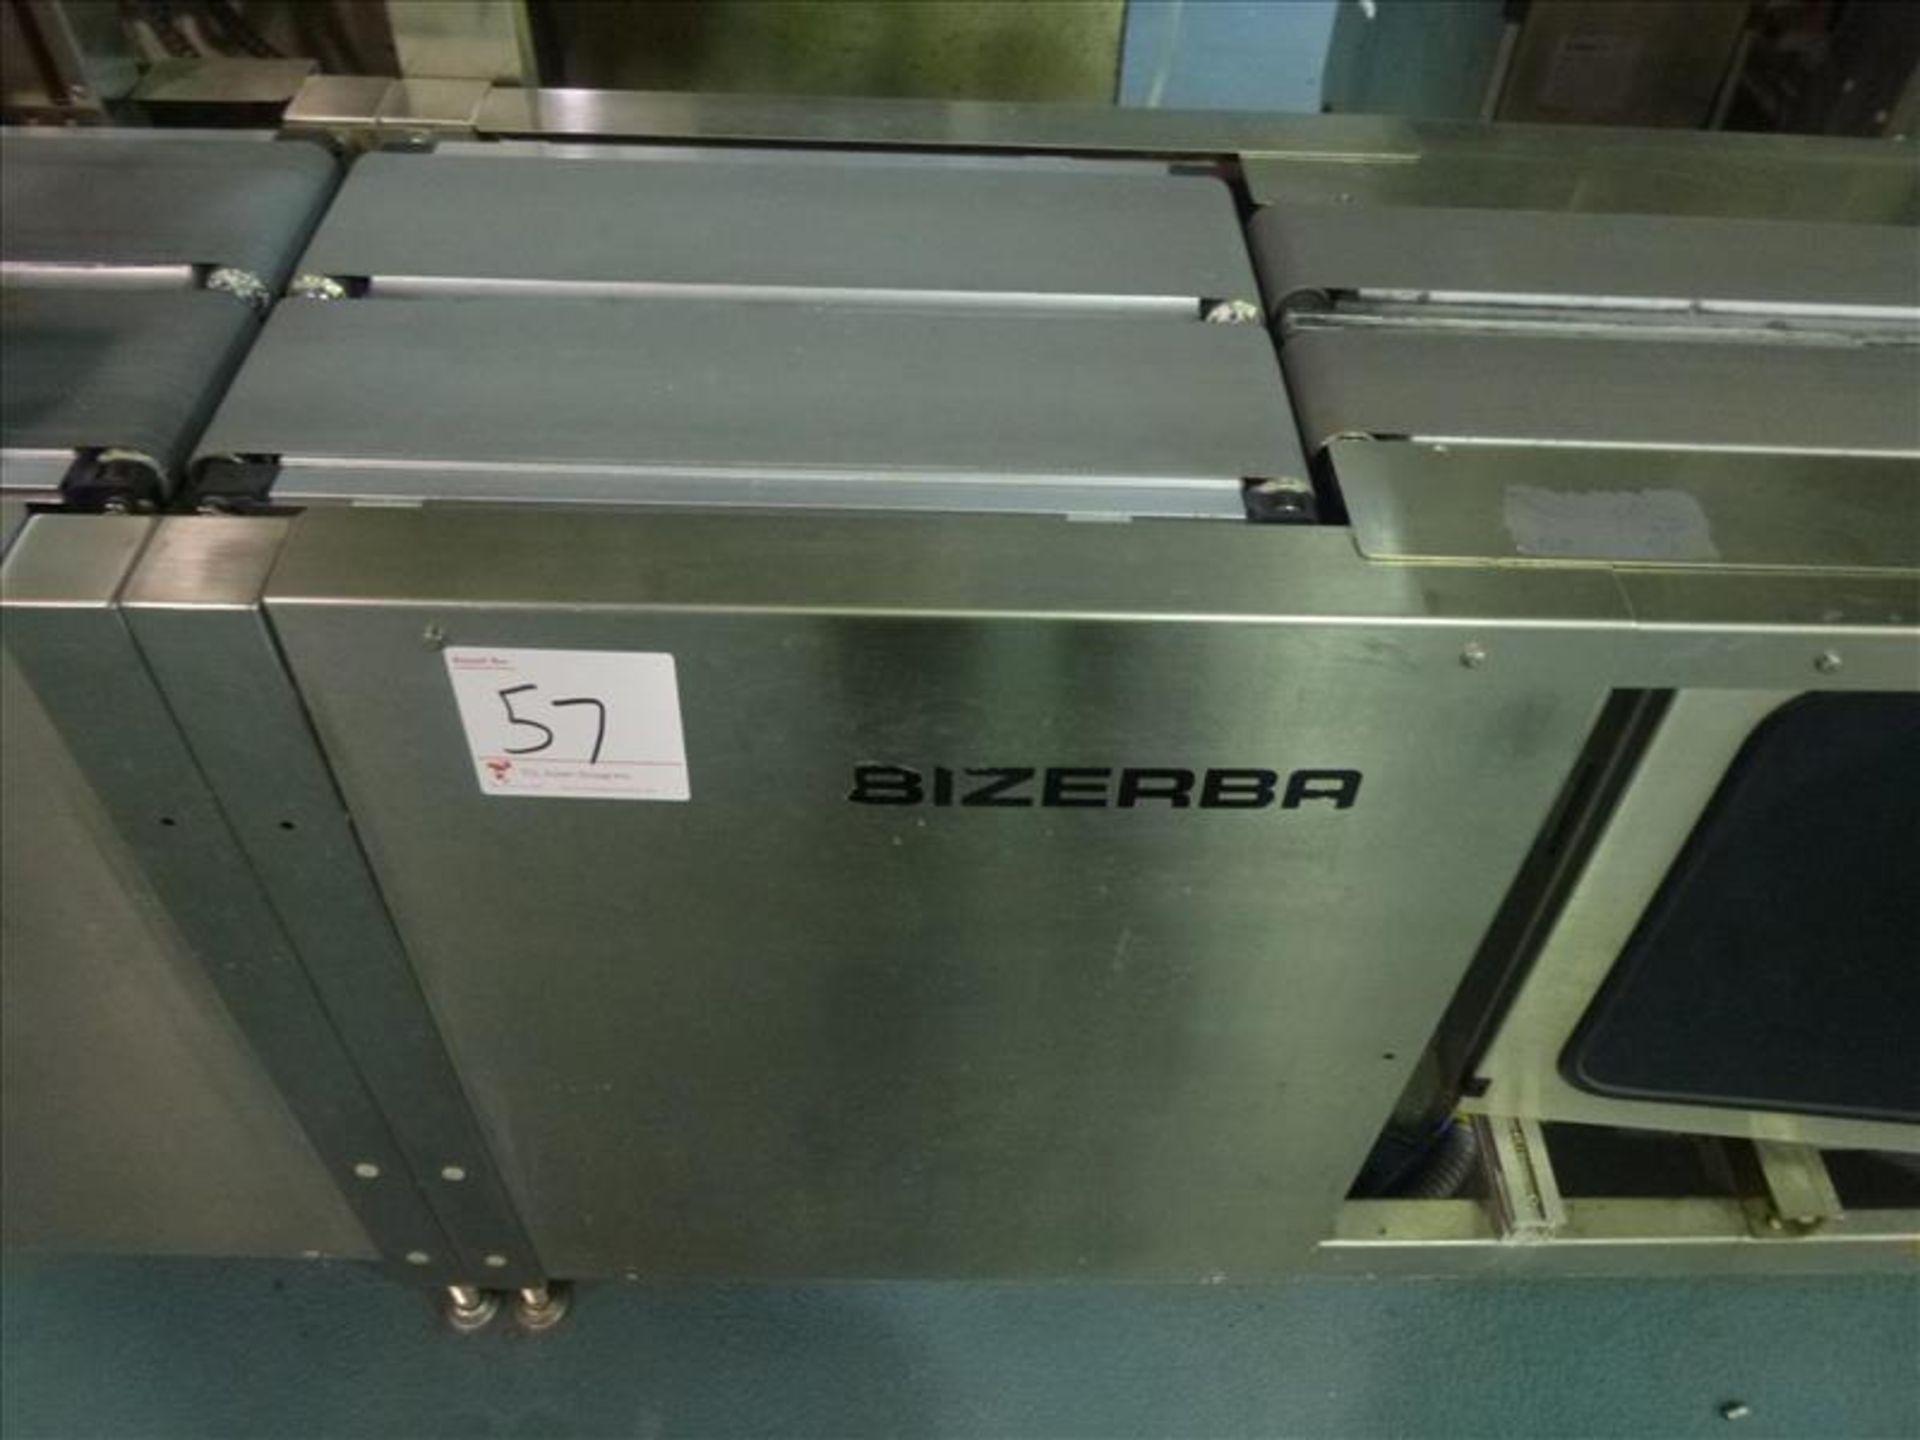 Lot 57 - Bizerba in-line check-weigher system (SLAVE1) w/ Bizerba GS label printer and Bizerba AB controller,